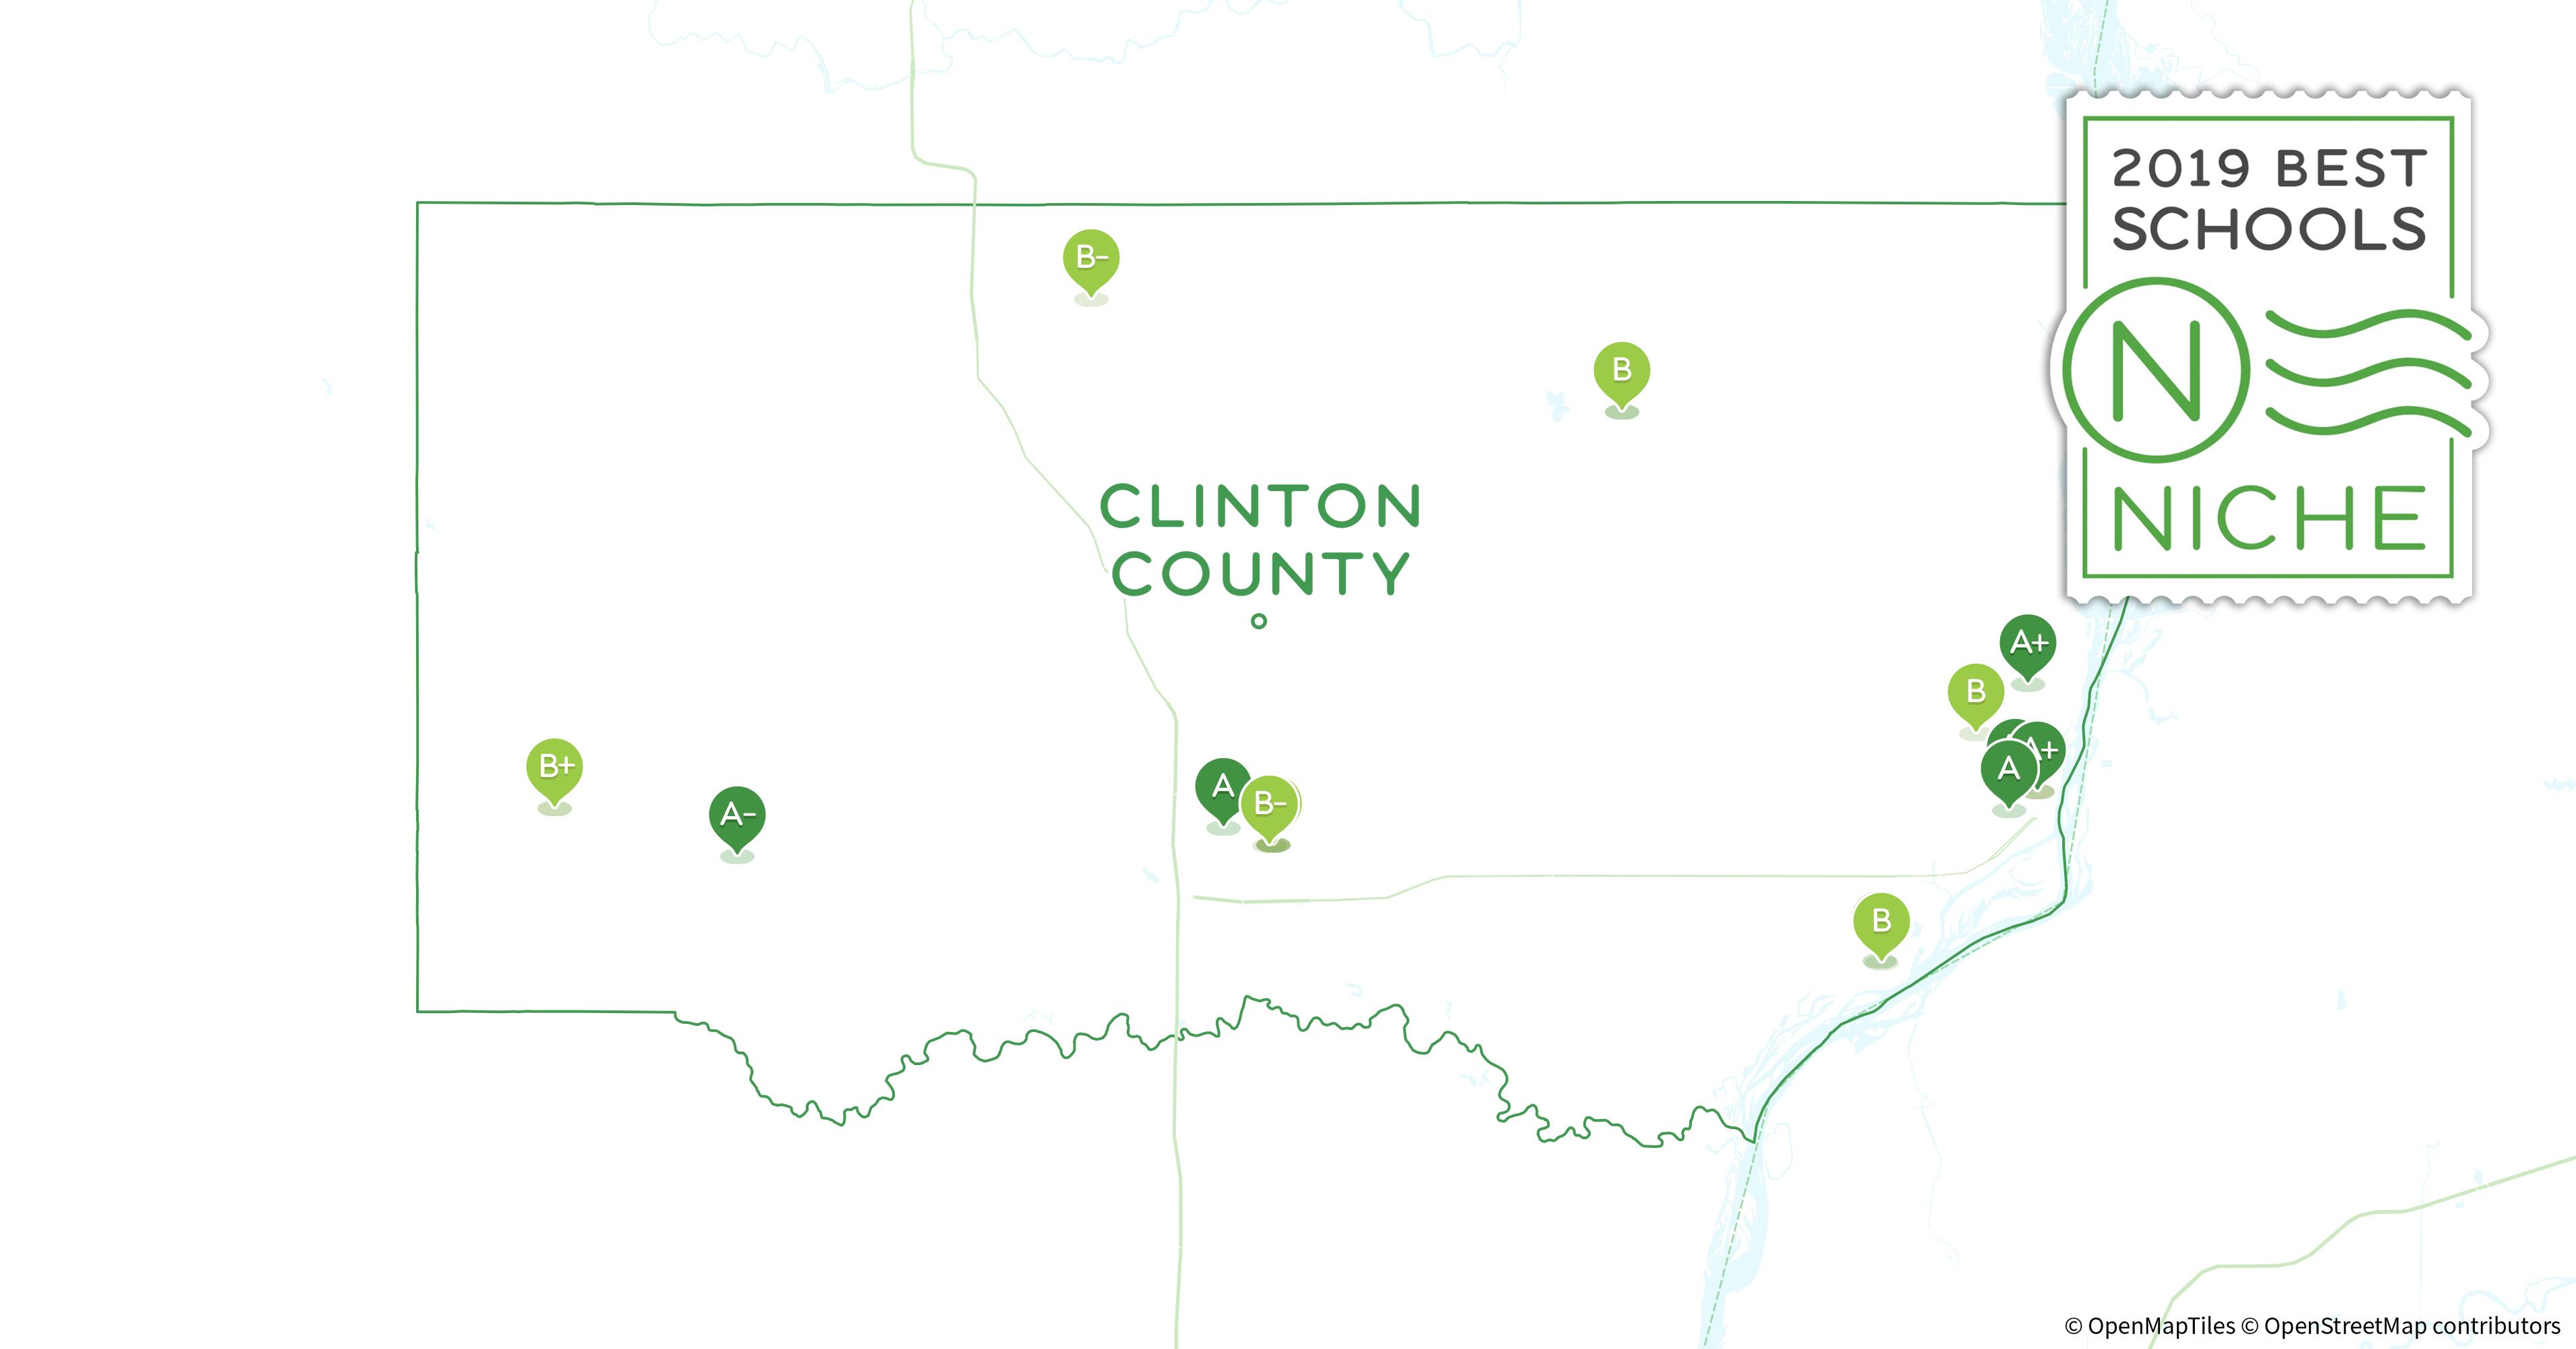 School Districts In Clinton County Ia Niche